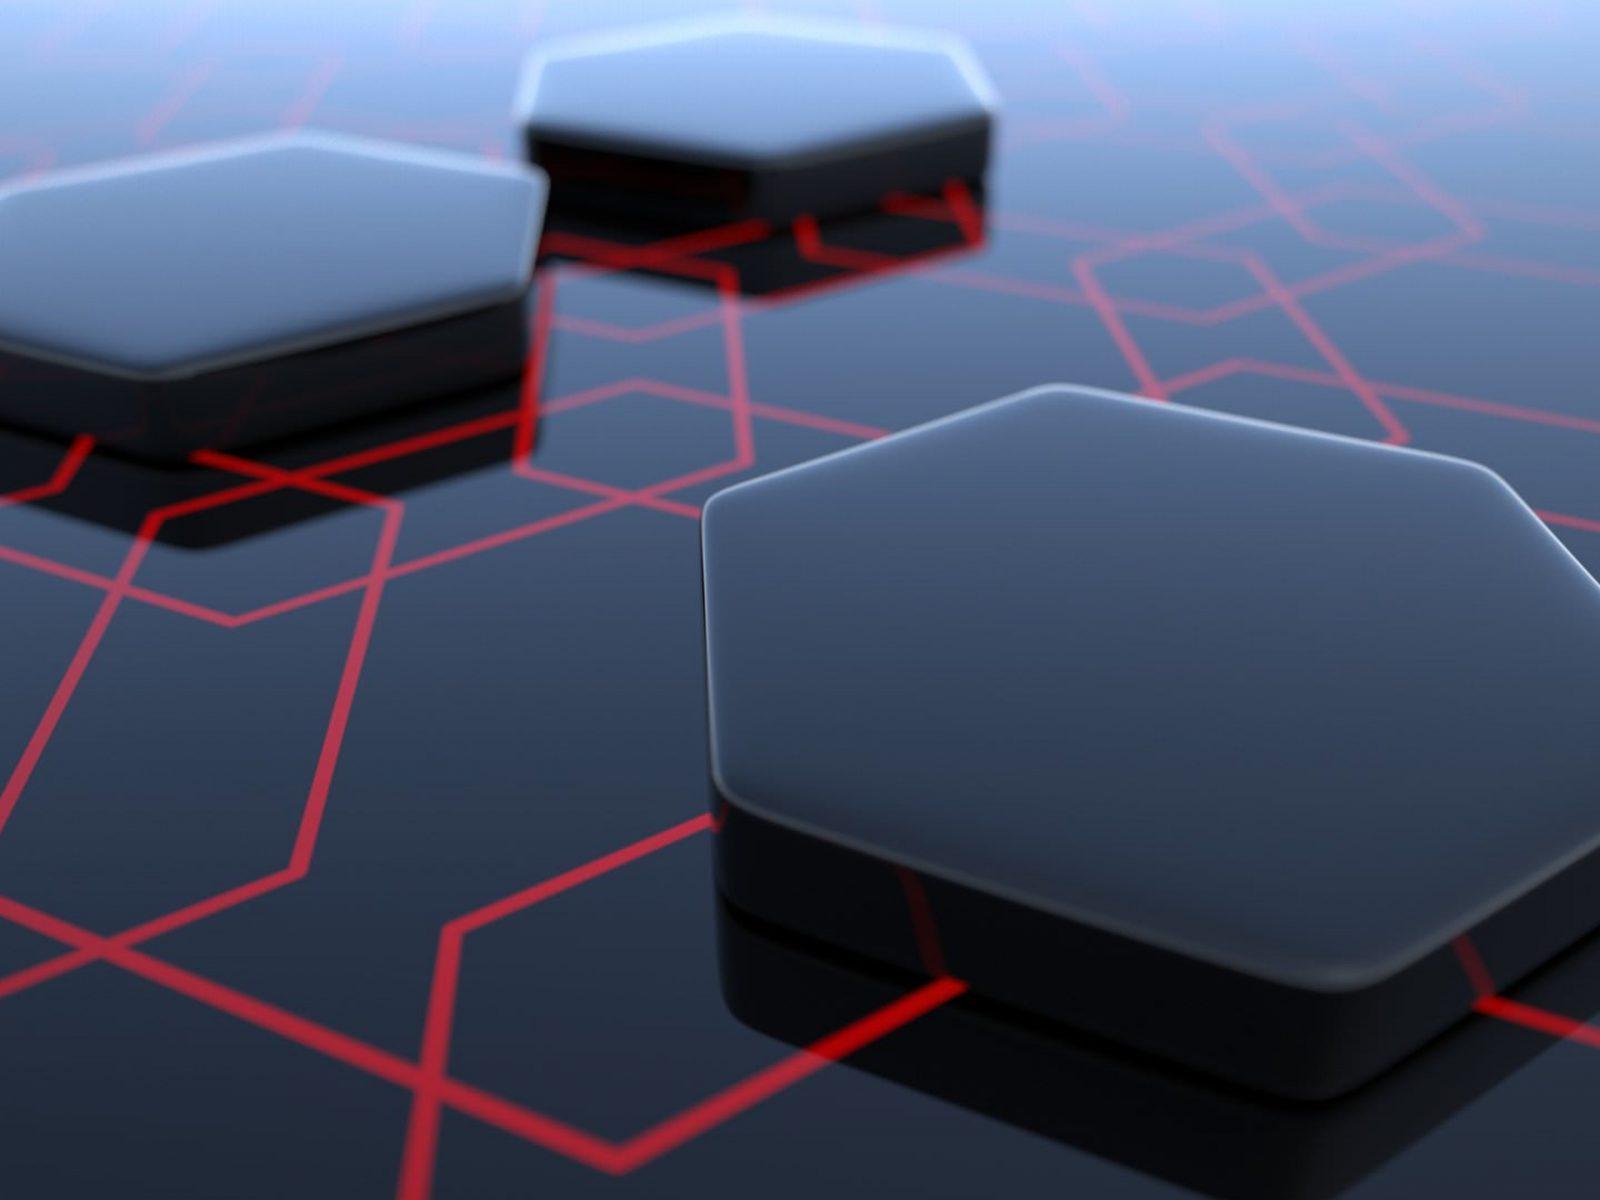 Abstract Hexagon 3D Black 4K Wallpaper